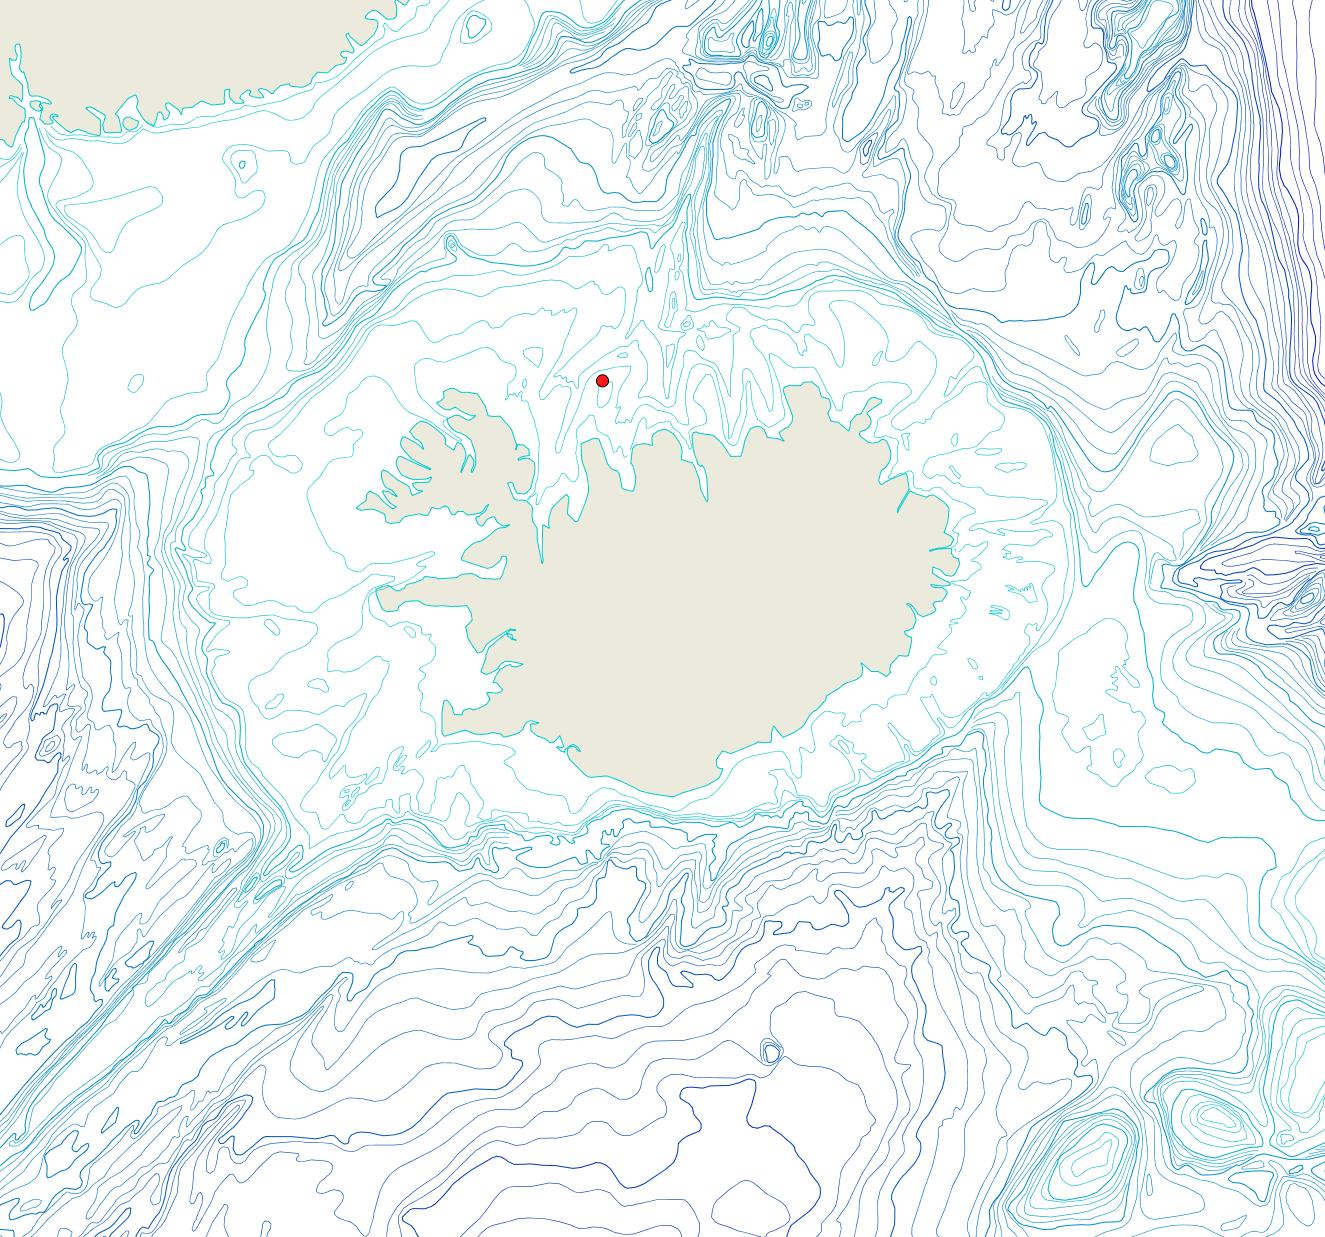 Útbreiðsla Porella belli(Bioice samples, red dots)